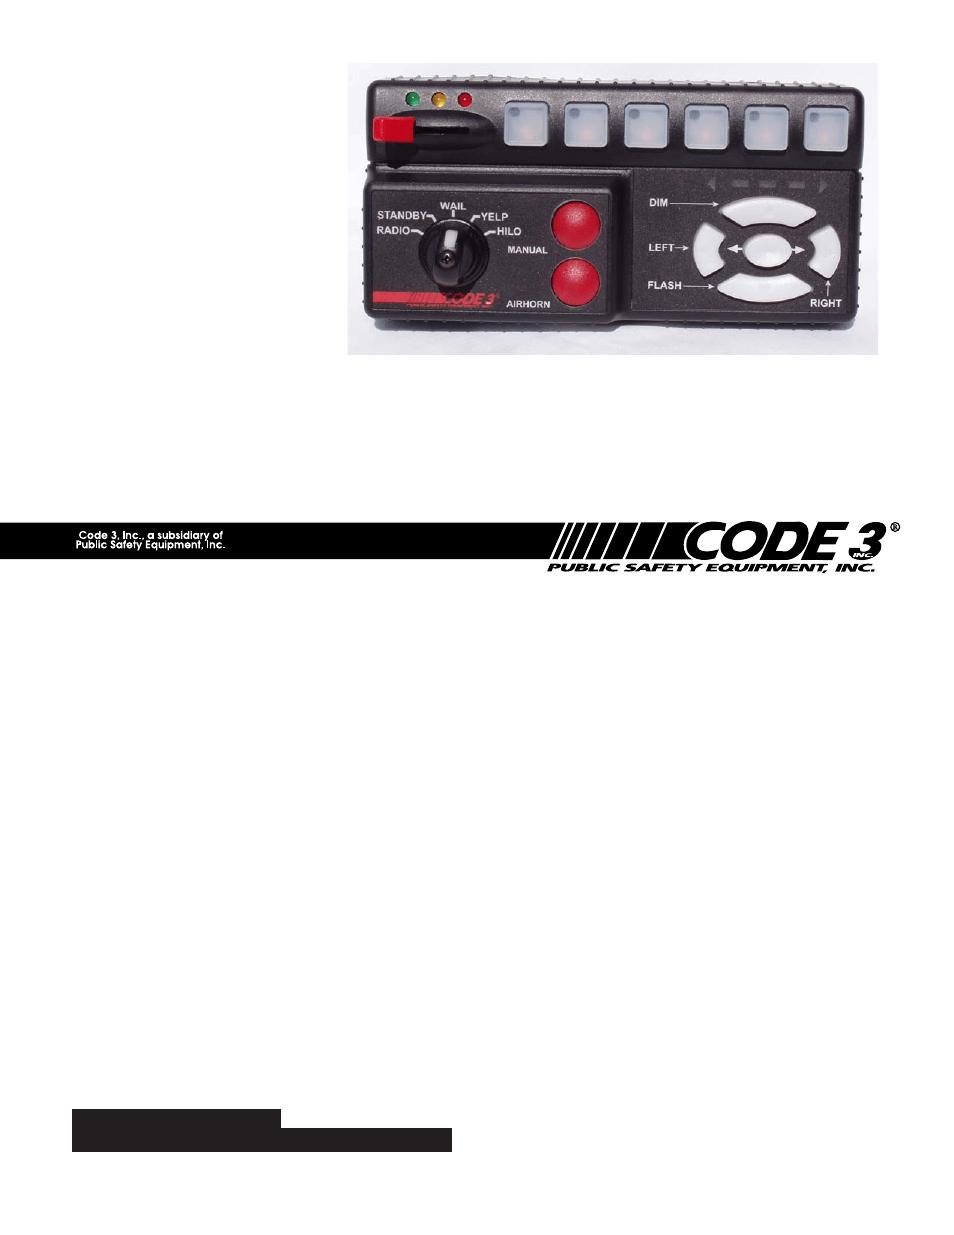 hight resolution of code 3 rls user manual 28 pagescode 3 siren wiring diagram 4